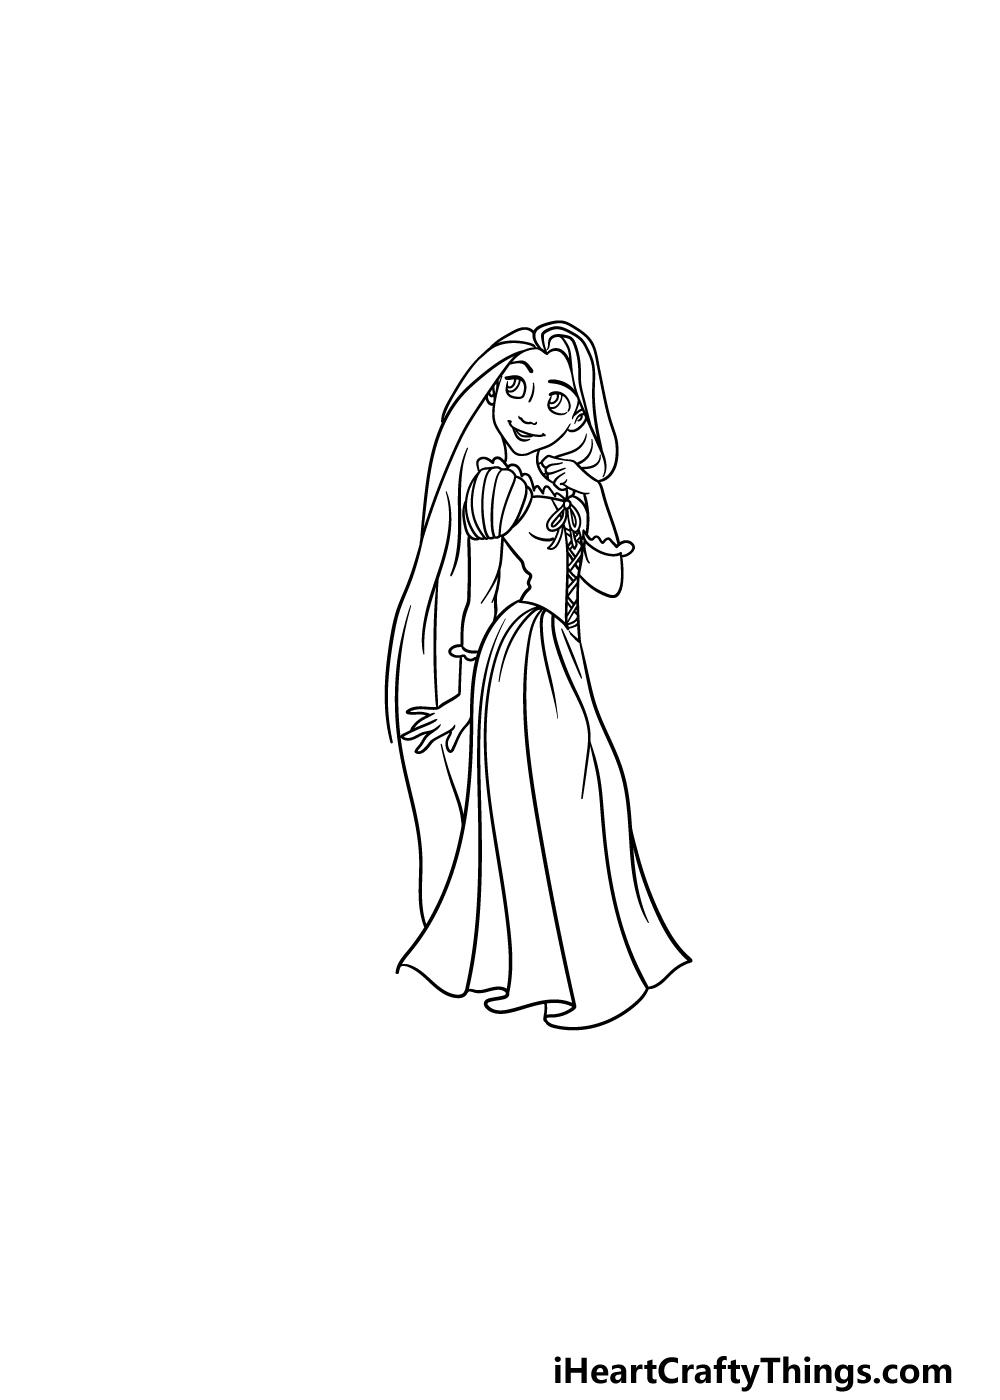 drawing Rapunzel step 5